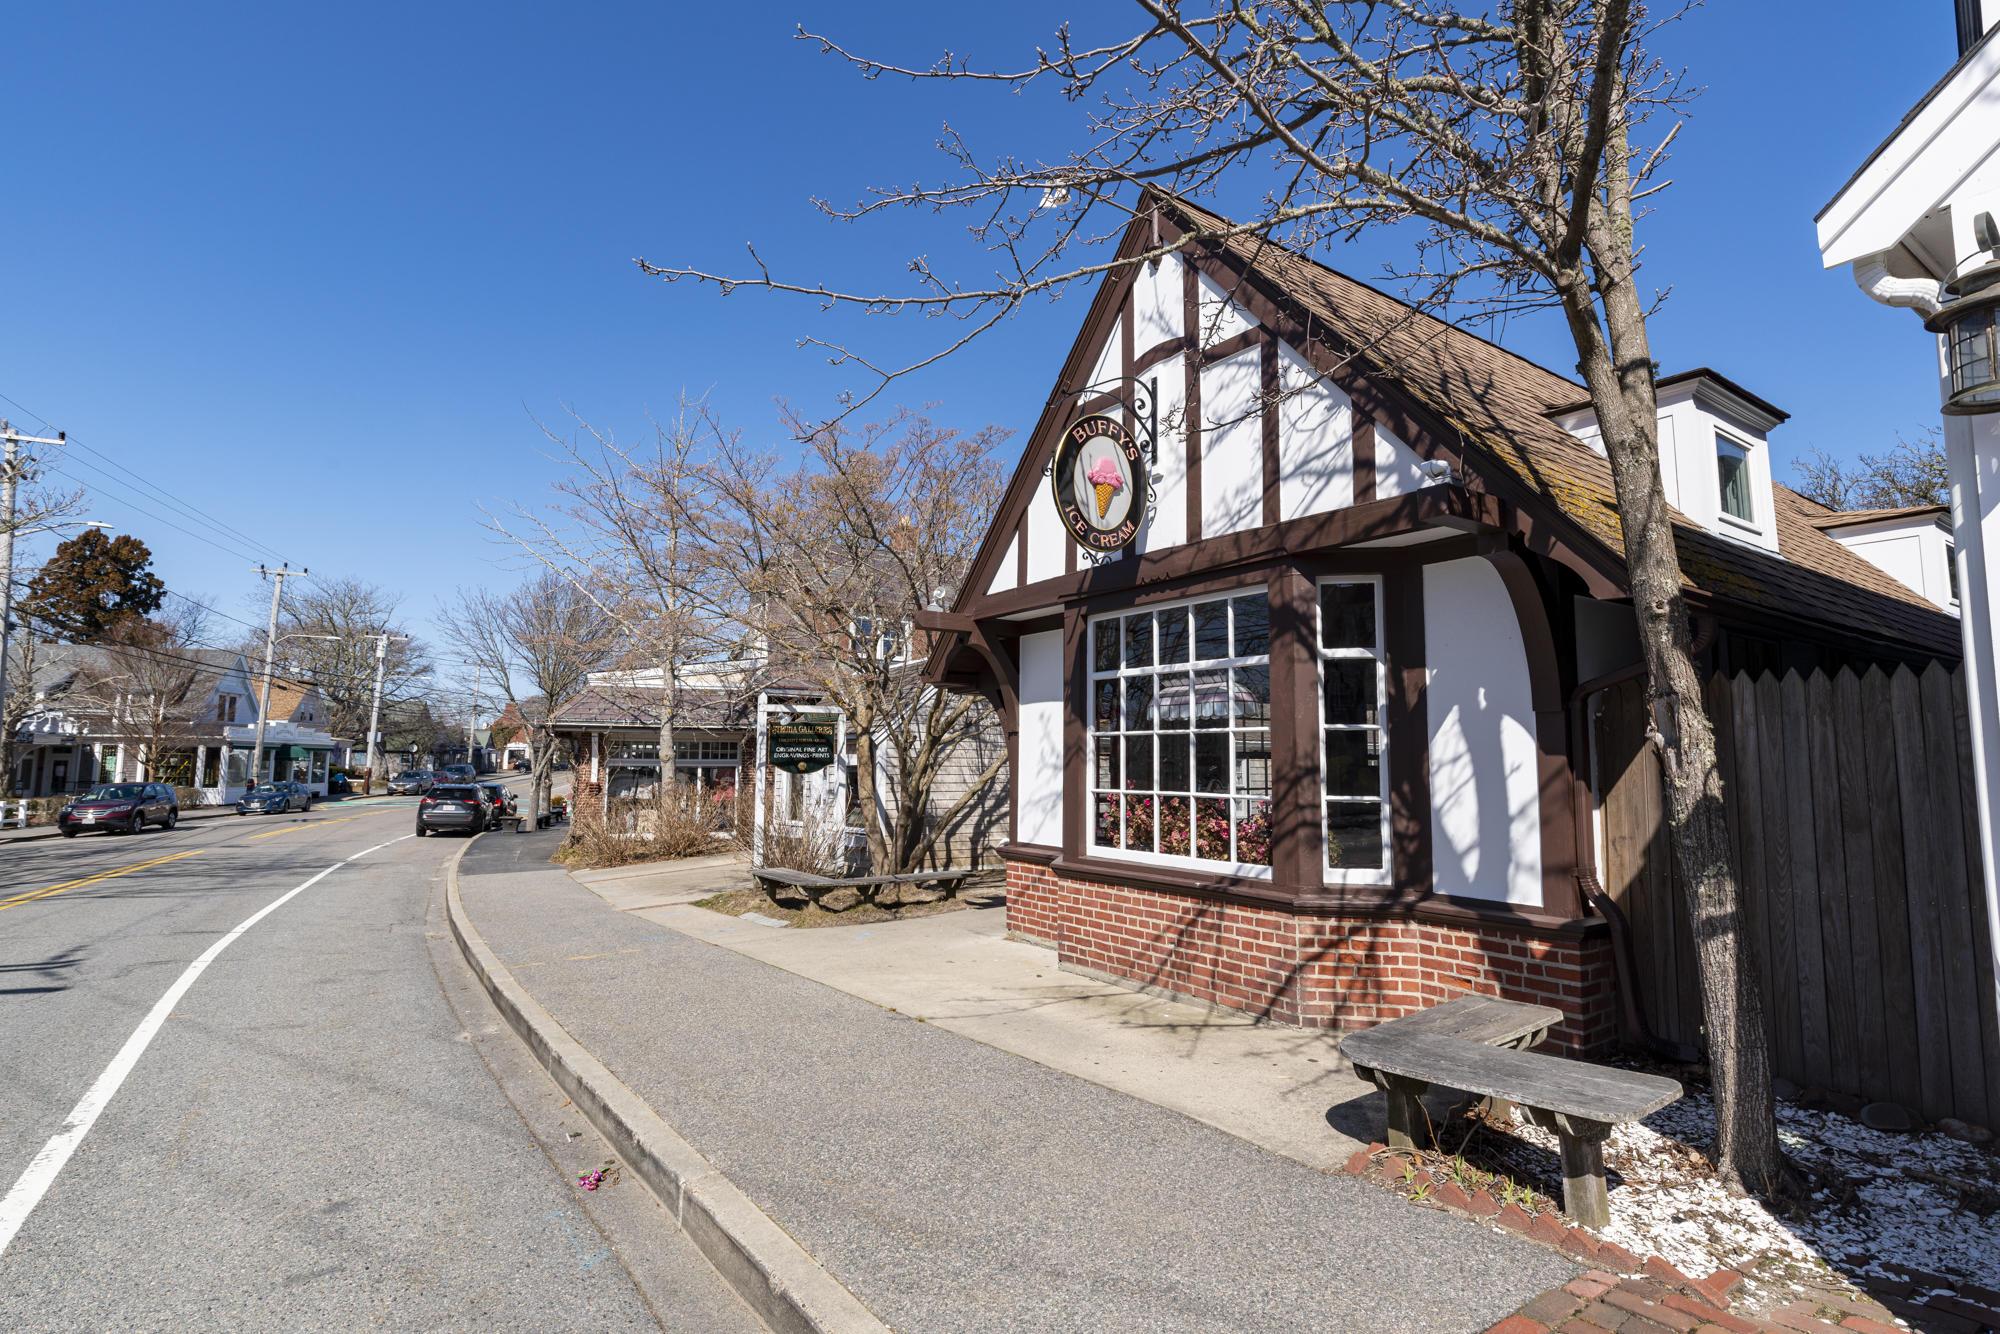 456 Main Street, Chatham, MA  02633 - slide 12